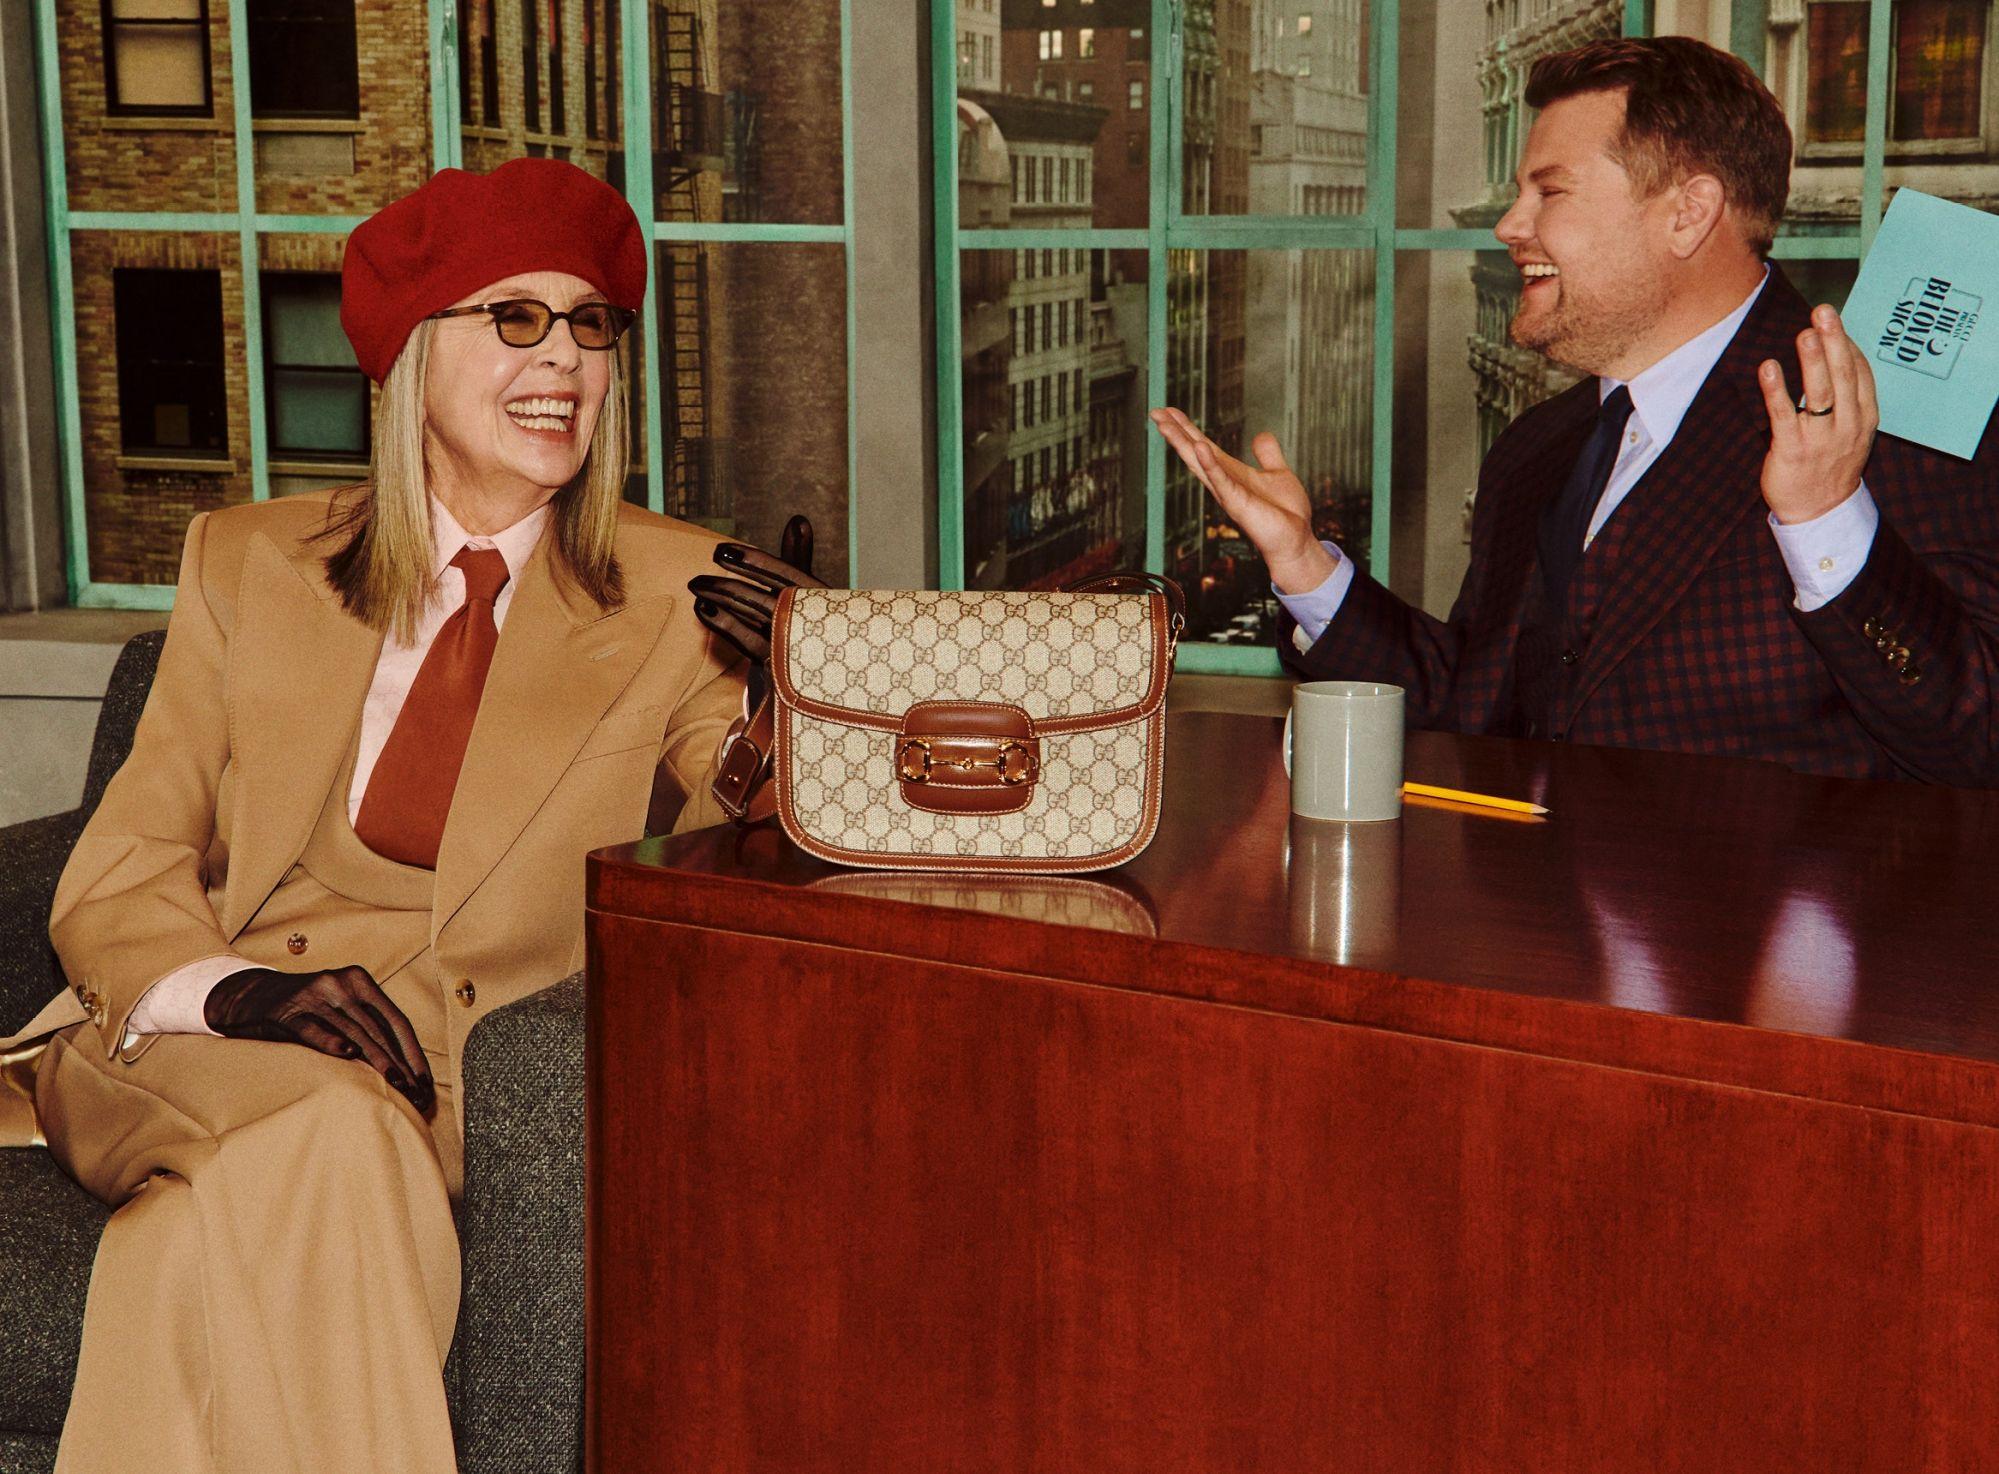 Diane Keaton x gucci - neomag.